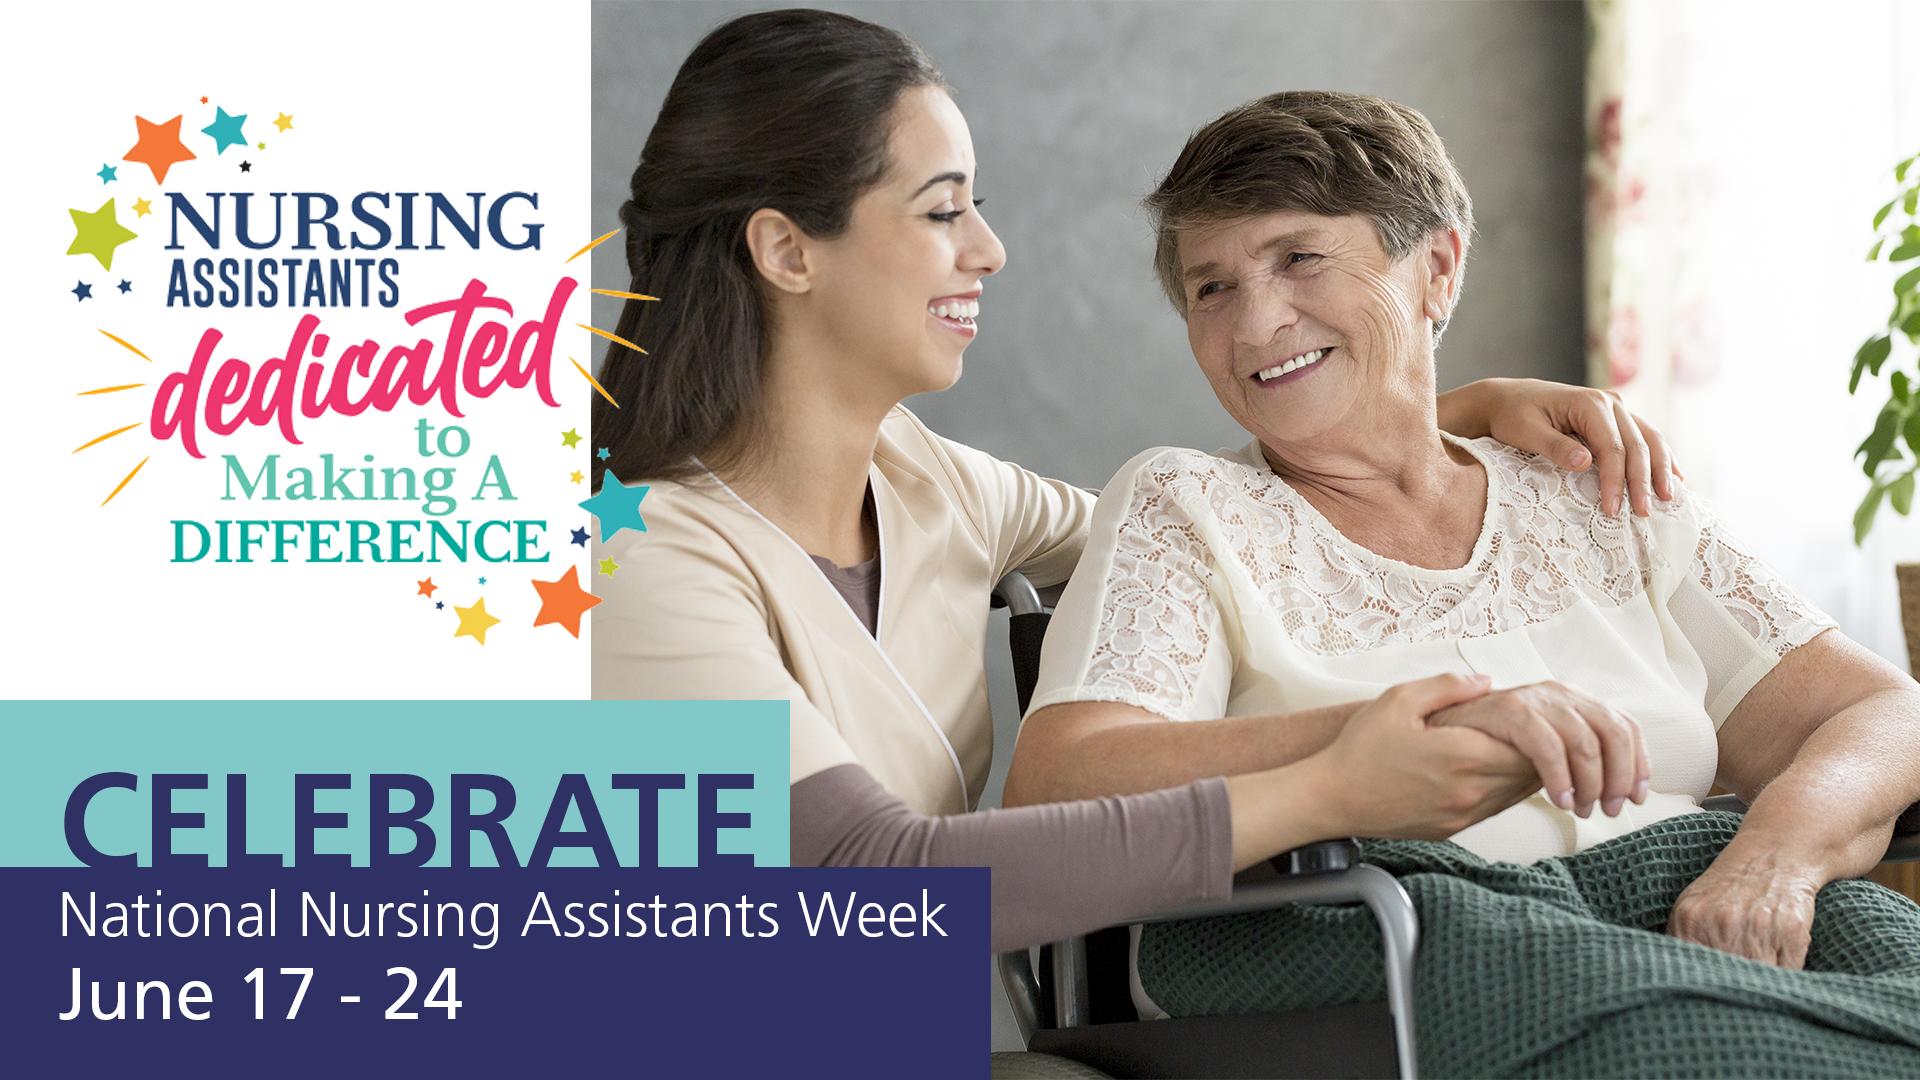 Announcement National Week Month nursing assistant - We Love Our Nursing Assistants. It's National Nursing Assistants Week.